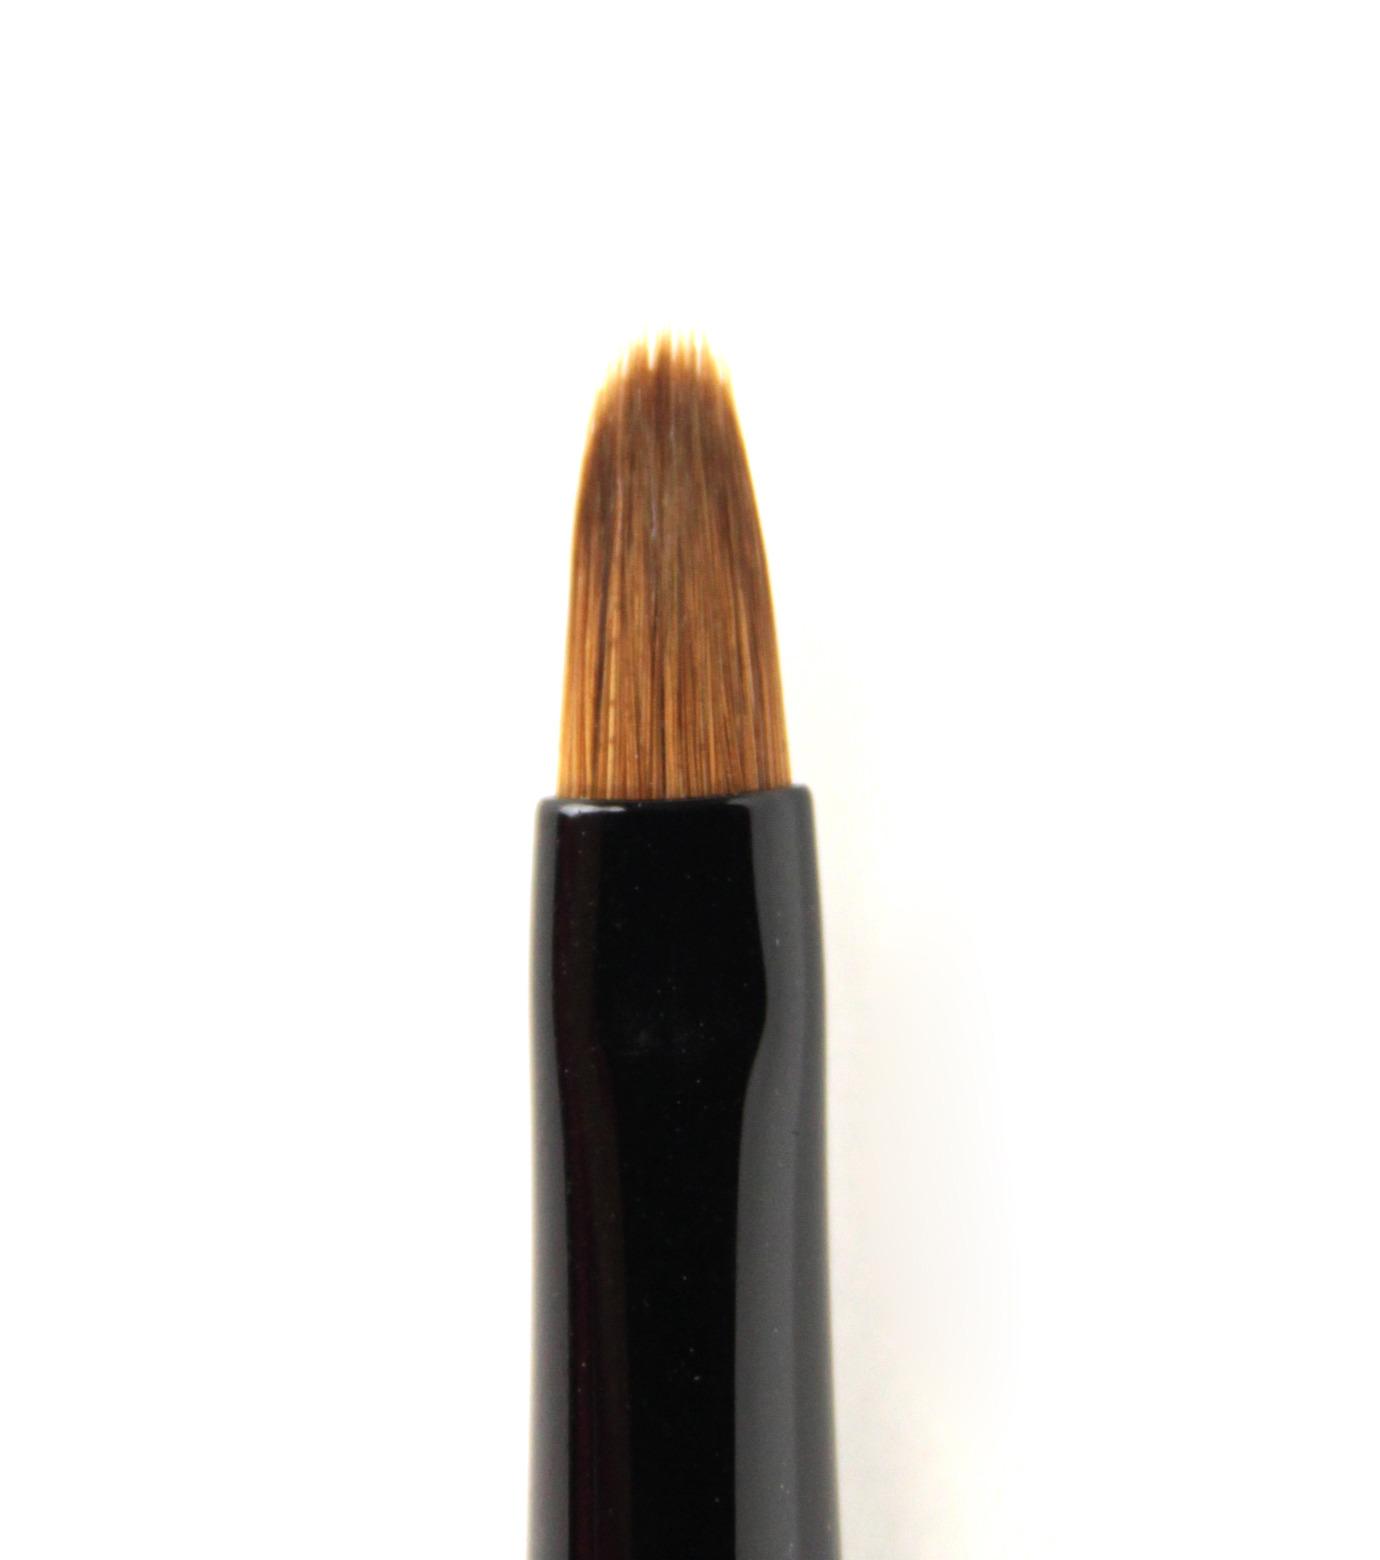 GRANJE(グランジェ)のGel Brush 1 Round-BLACK(MAKE-UP/MAKE-UP)-910-13 拡大詳細画像1